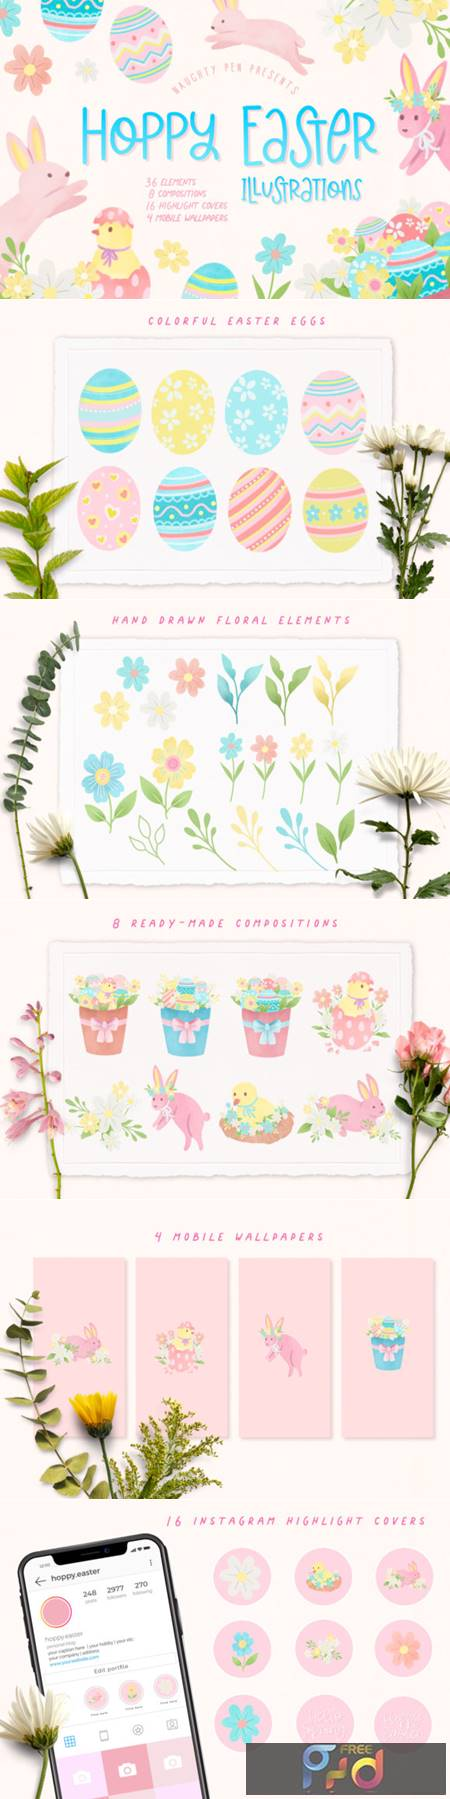 Hoppy Easter Spring Bunnies Illustration 8638459 1